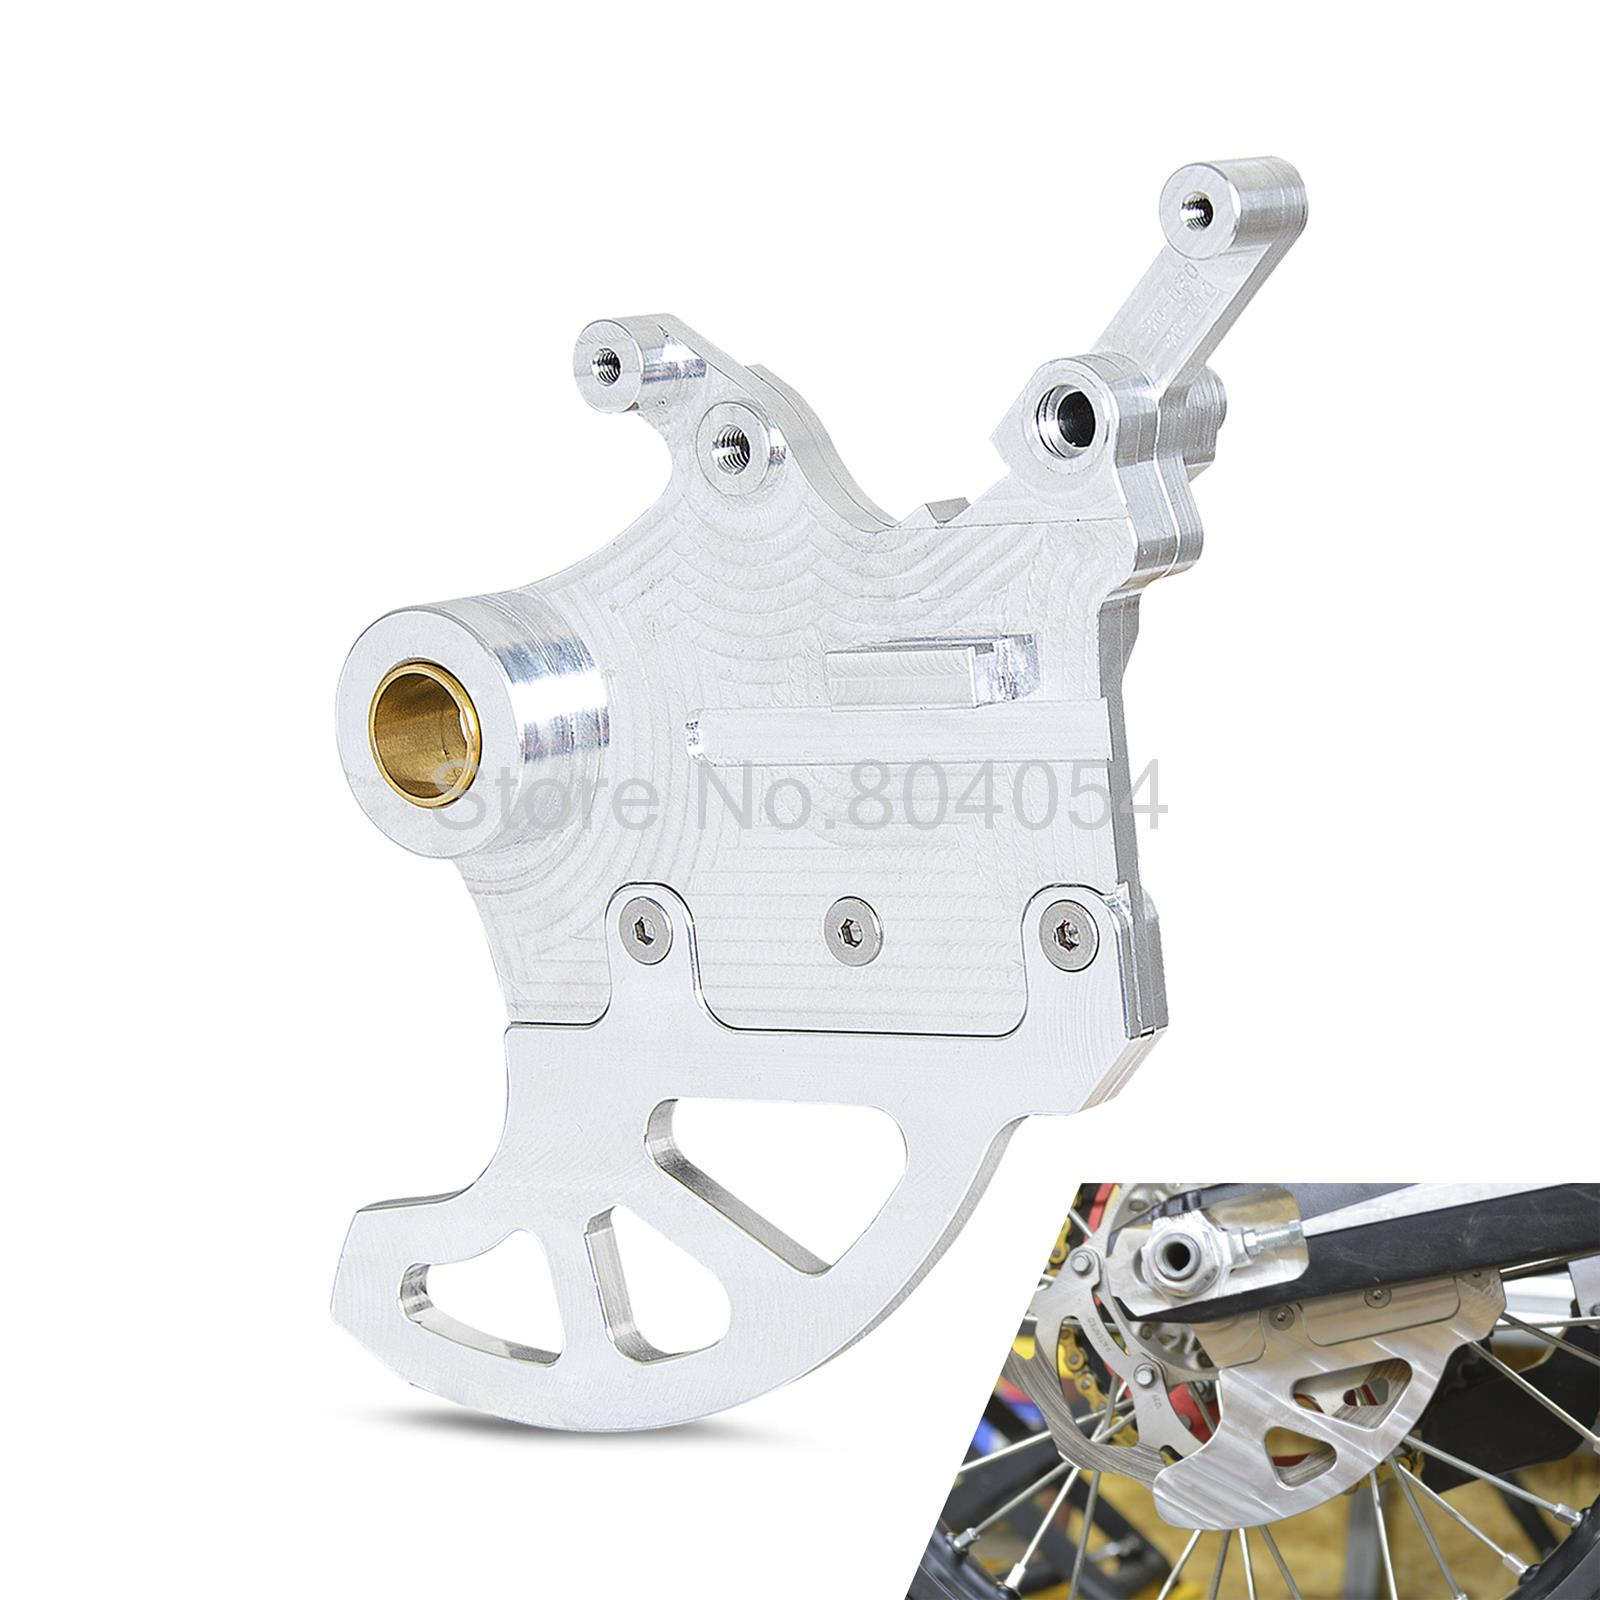 NICECNC Brake Disc Guard Protector for Yamaha YZ125 YZ250 YZ250F YZ450F WR250 WR450 YZ250X YZ250FX YZ450X YZ450FX dirt bike motorcycle 7 8 22mm handlebar brake hand guard for yamaha yz250x yz426f yz450f yz450fx yz80 yz85